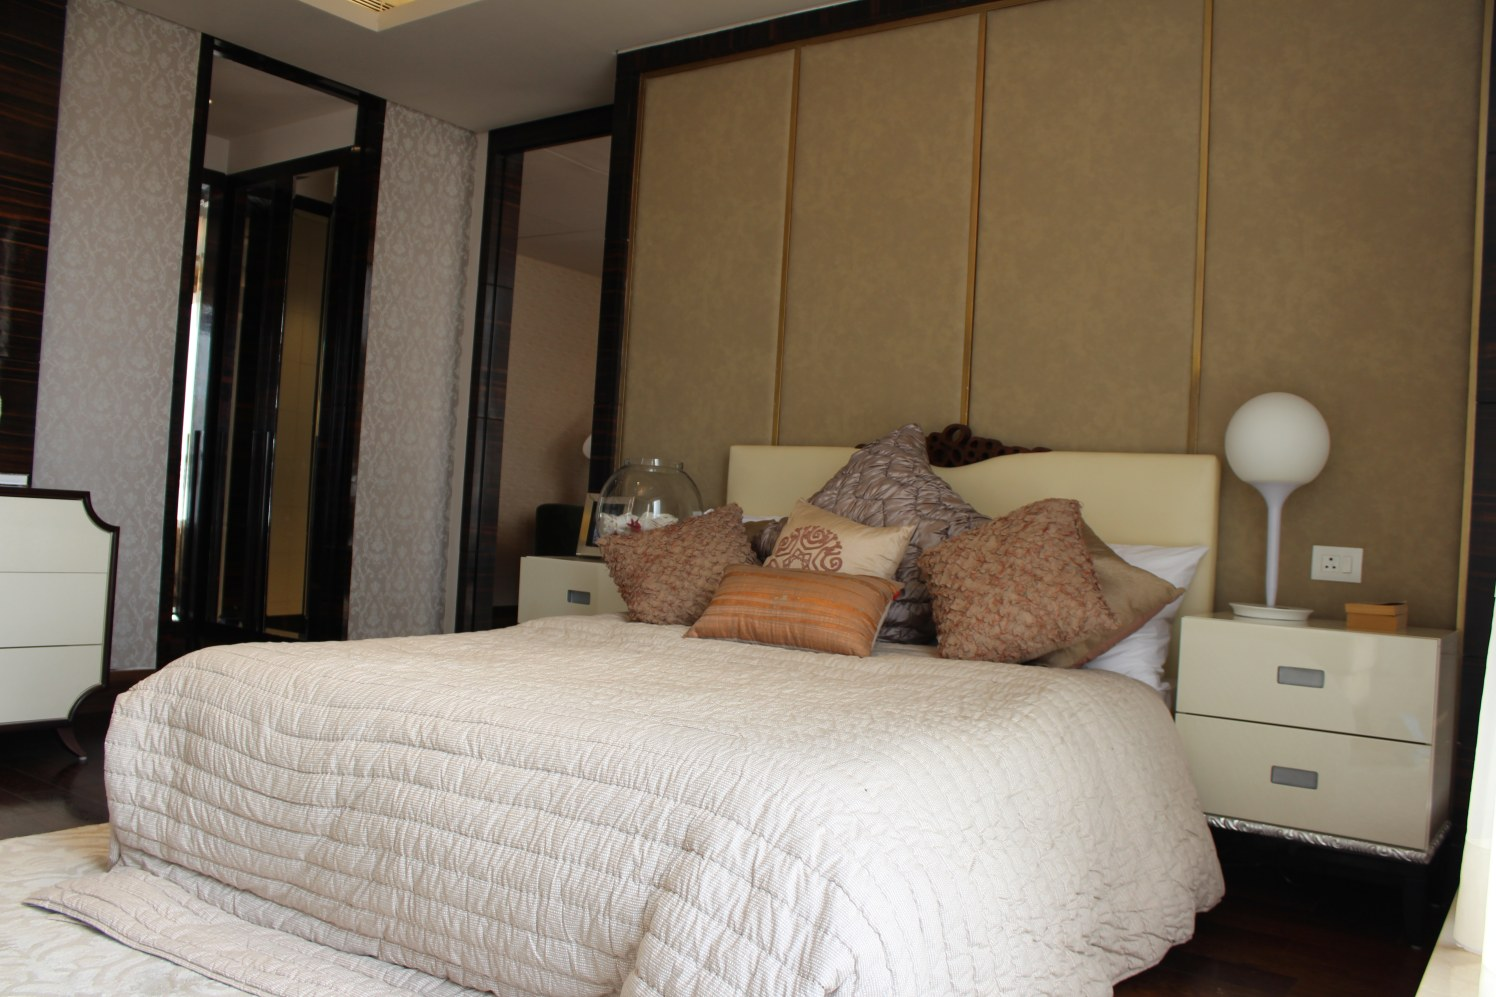 Warm And Cozy Bedroom With Impressive Wall Design by Sandeep Mehrwal Bedroom Contemporary | Interior Design Photos & Ideas